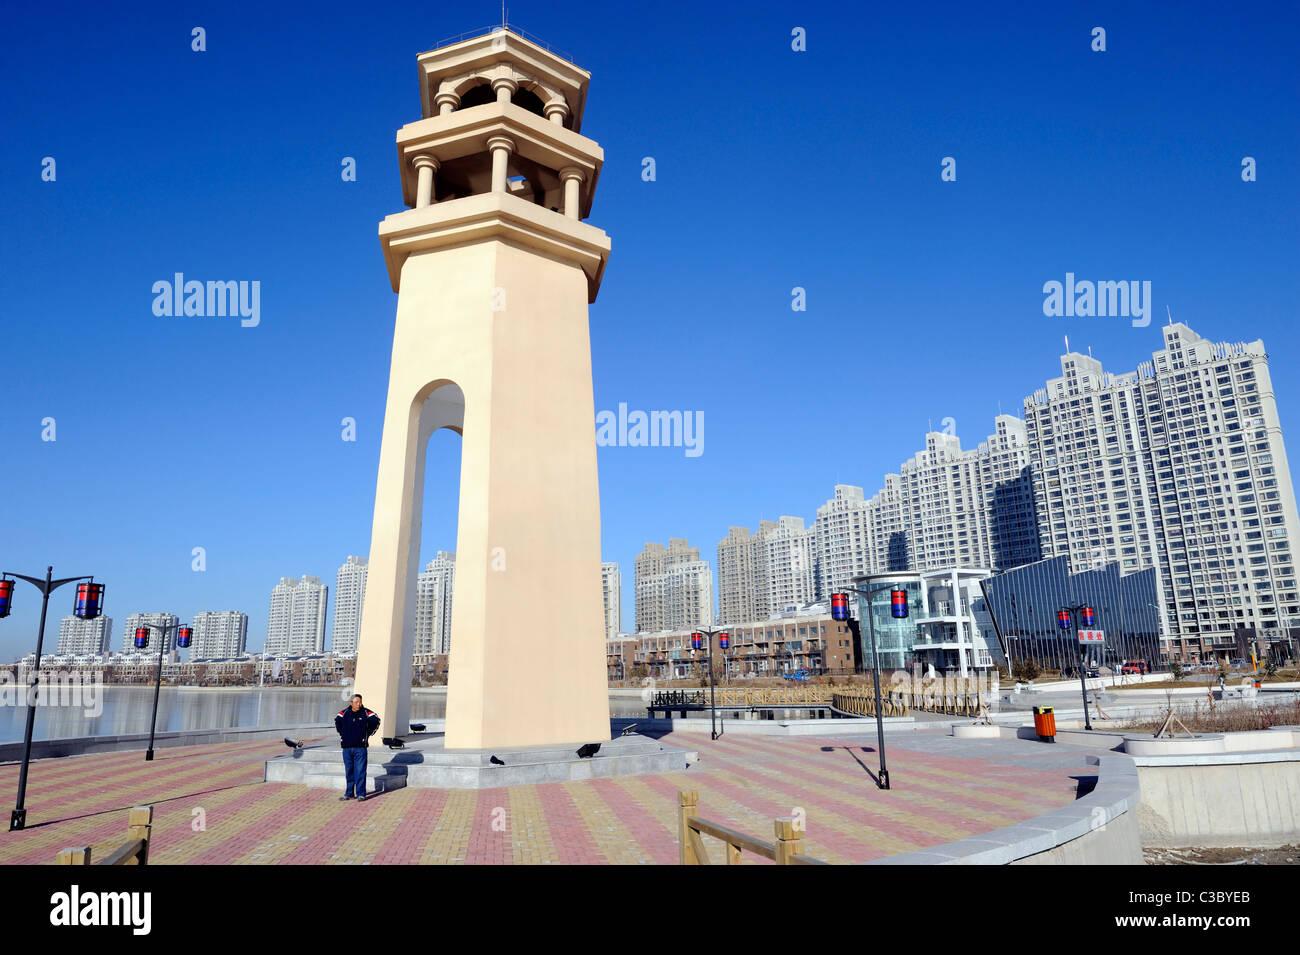 New property in Daqing, Heilongjiang, China. 09-Nov-2010 - Stock Image